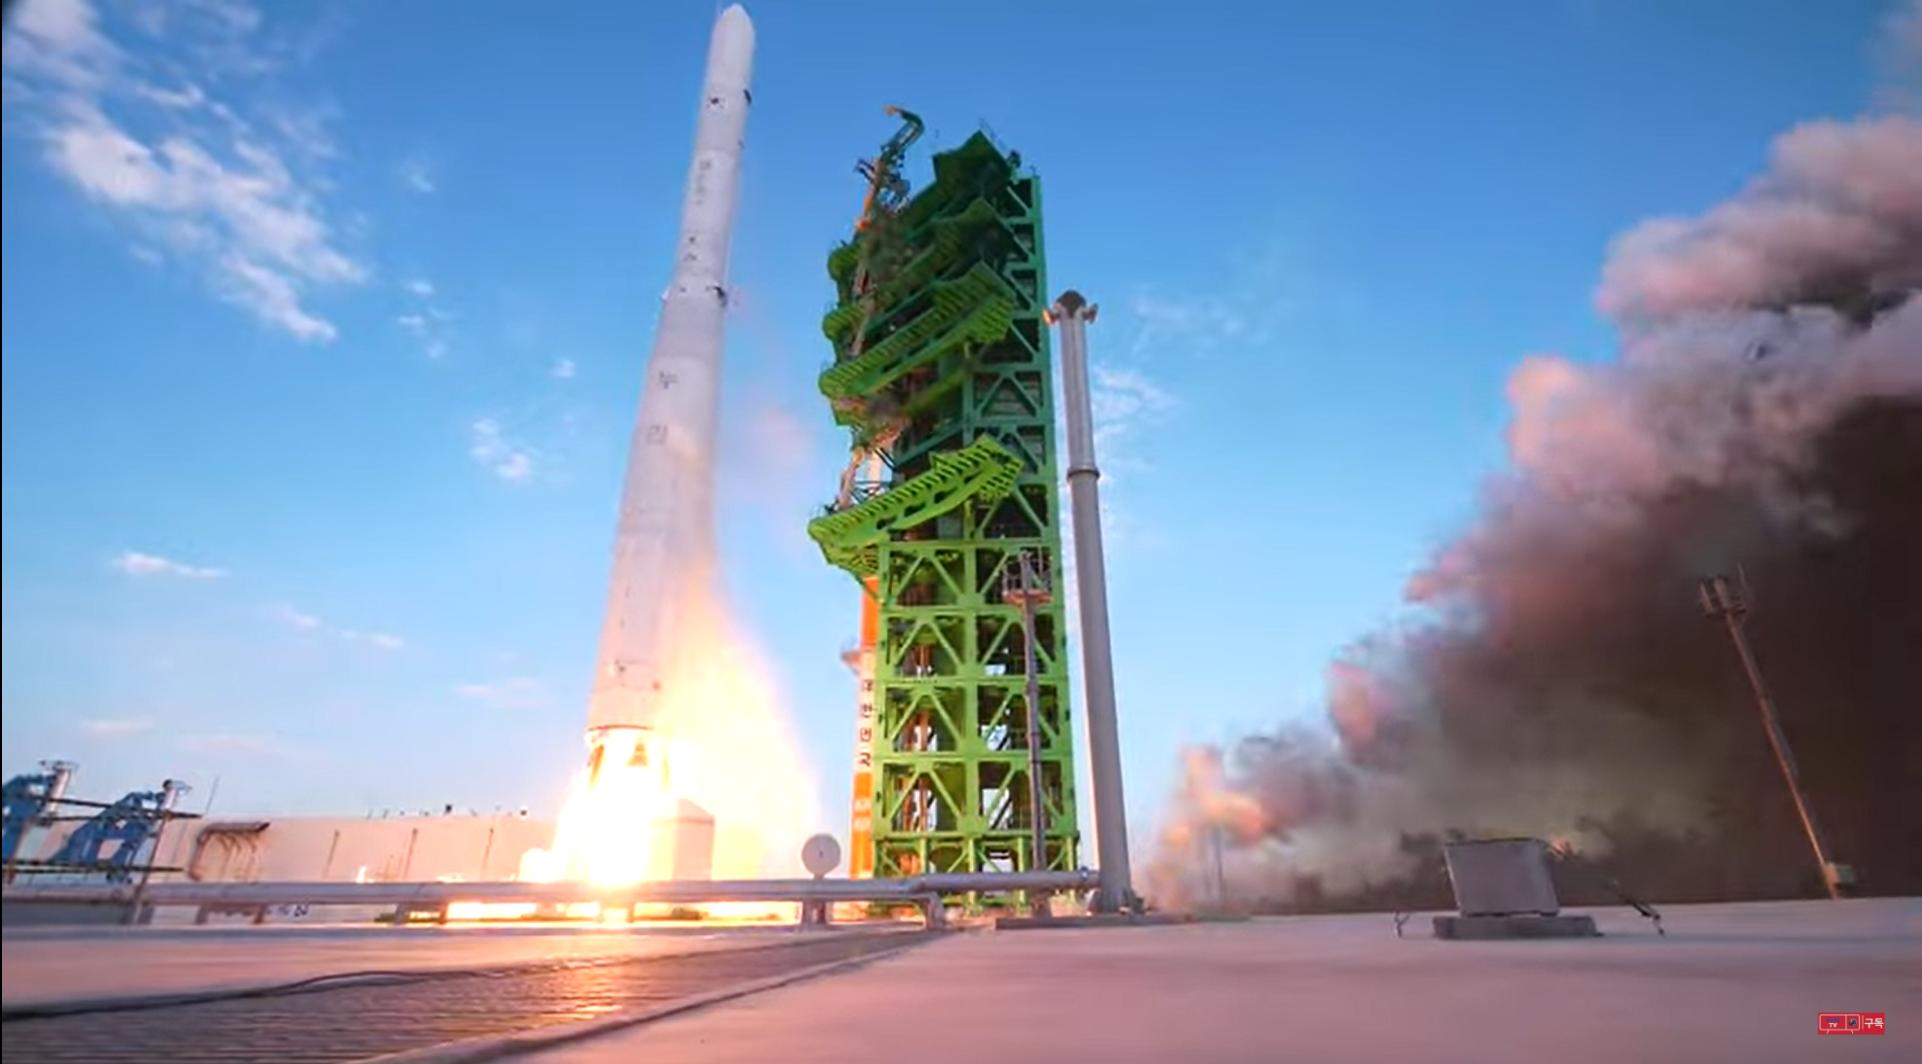 South Korea's 1st Nuri rocket fails to reach orbit in debut launch test